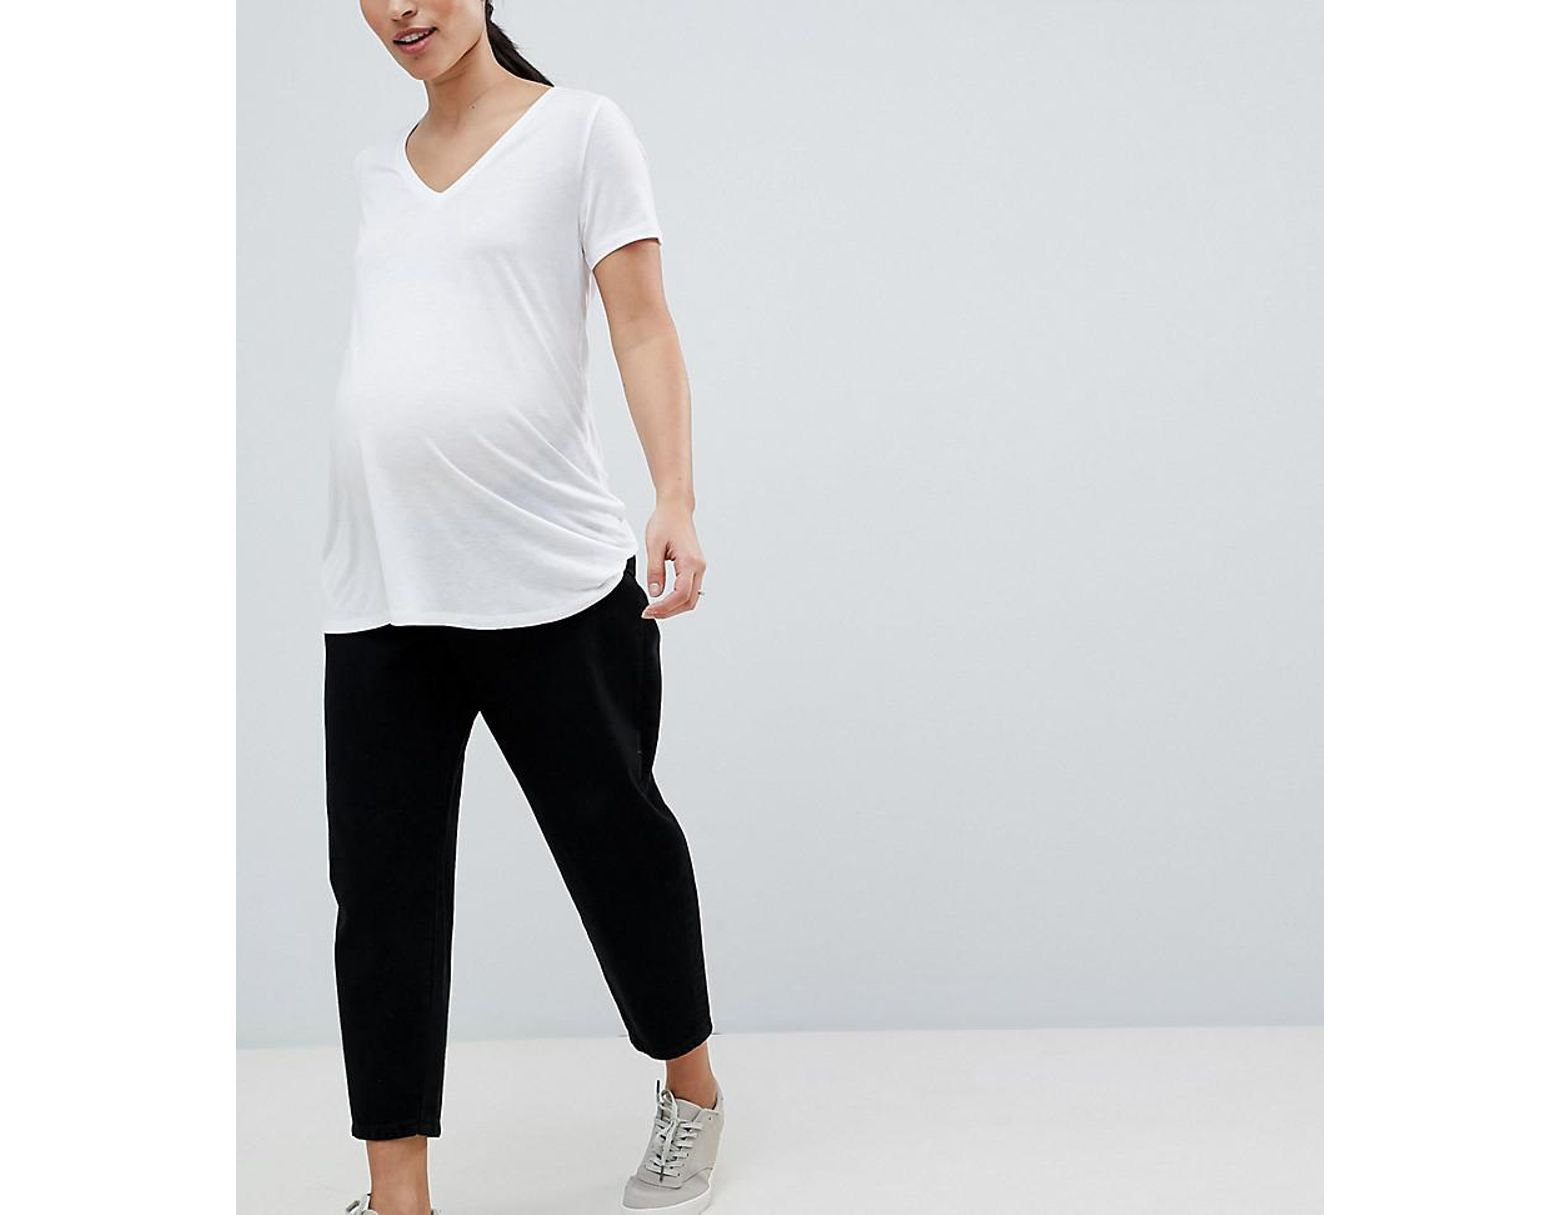 593c7504 Women's Asos Design Maternity Balloon Leg Boyfriend Jeans In Clean Black  With Side Bump Band